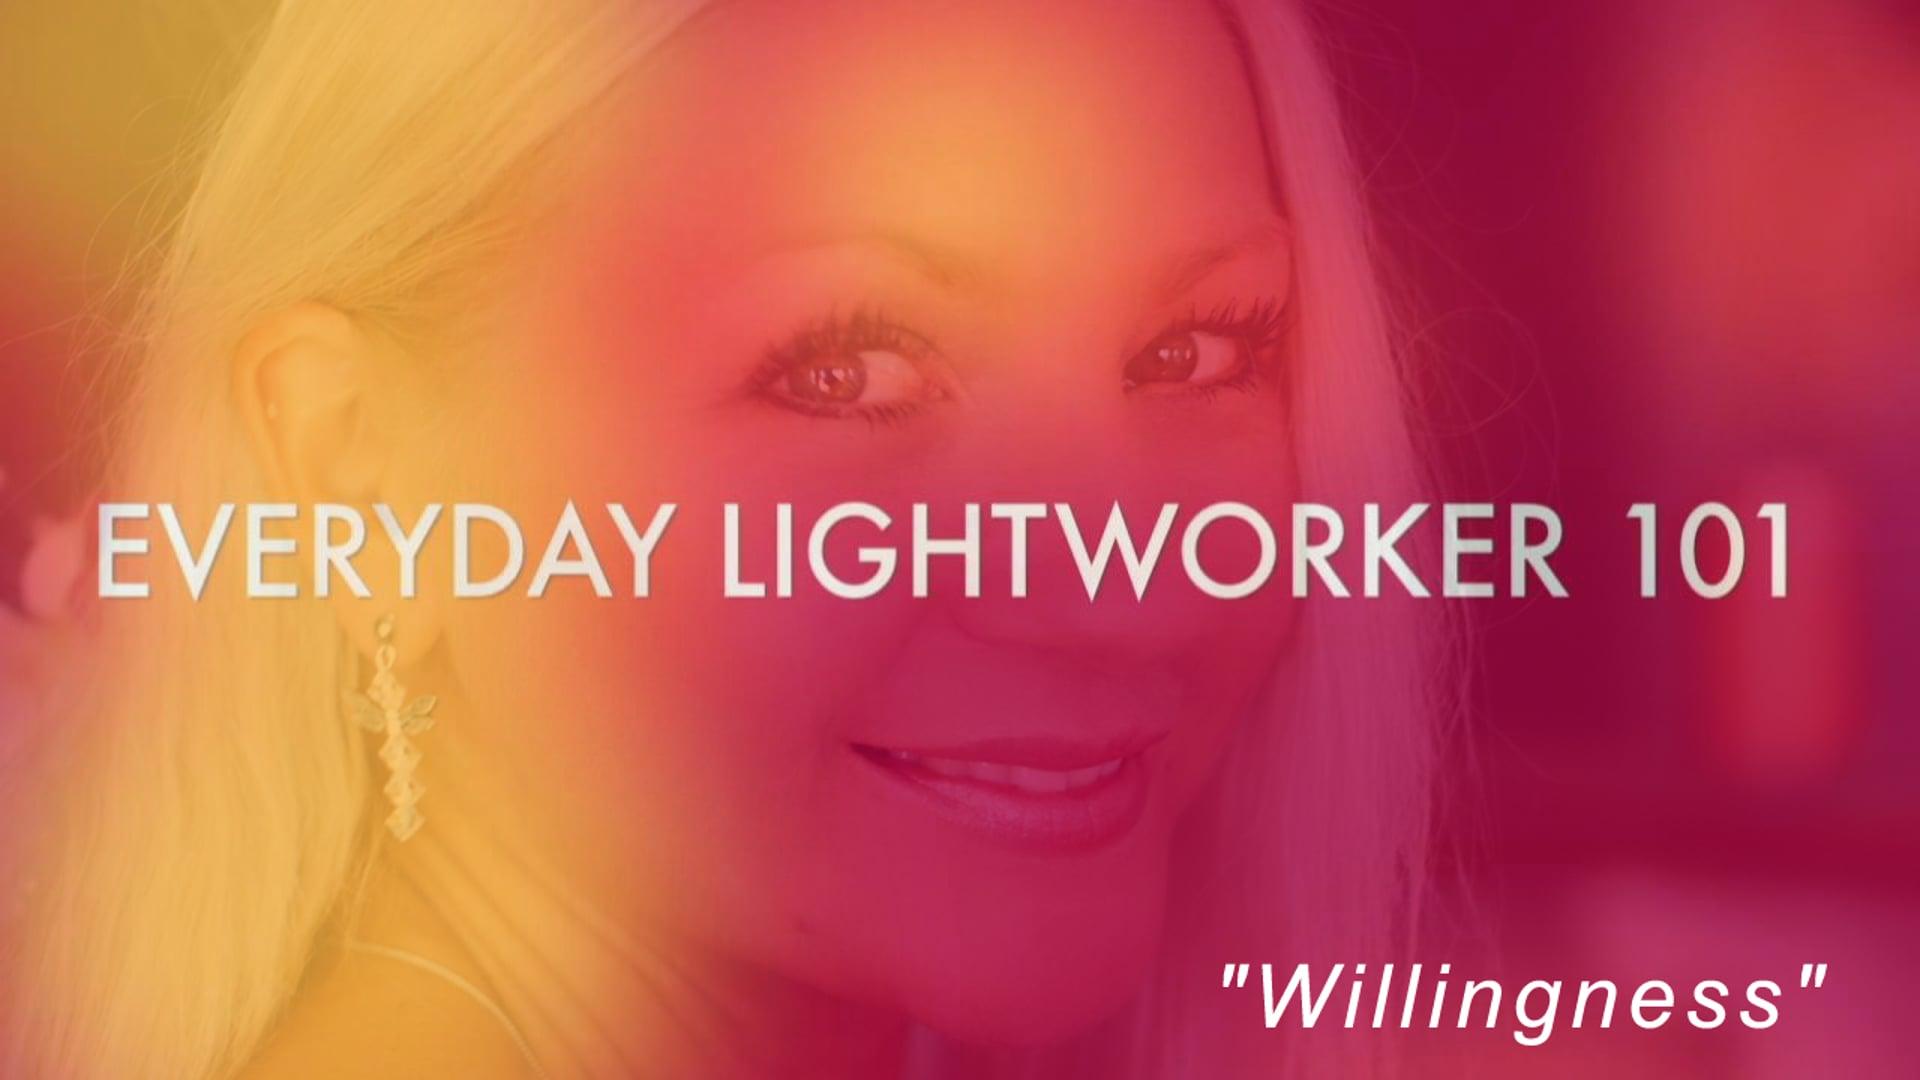 Everyday Lightworker 101: Willingness